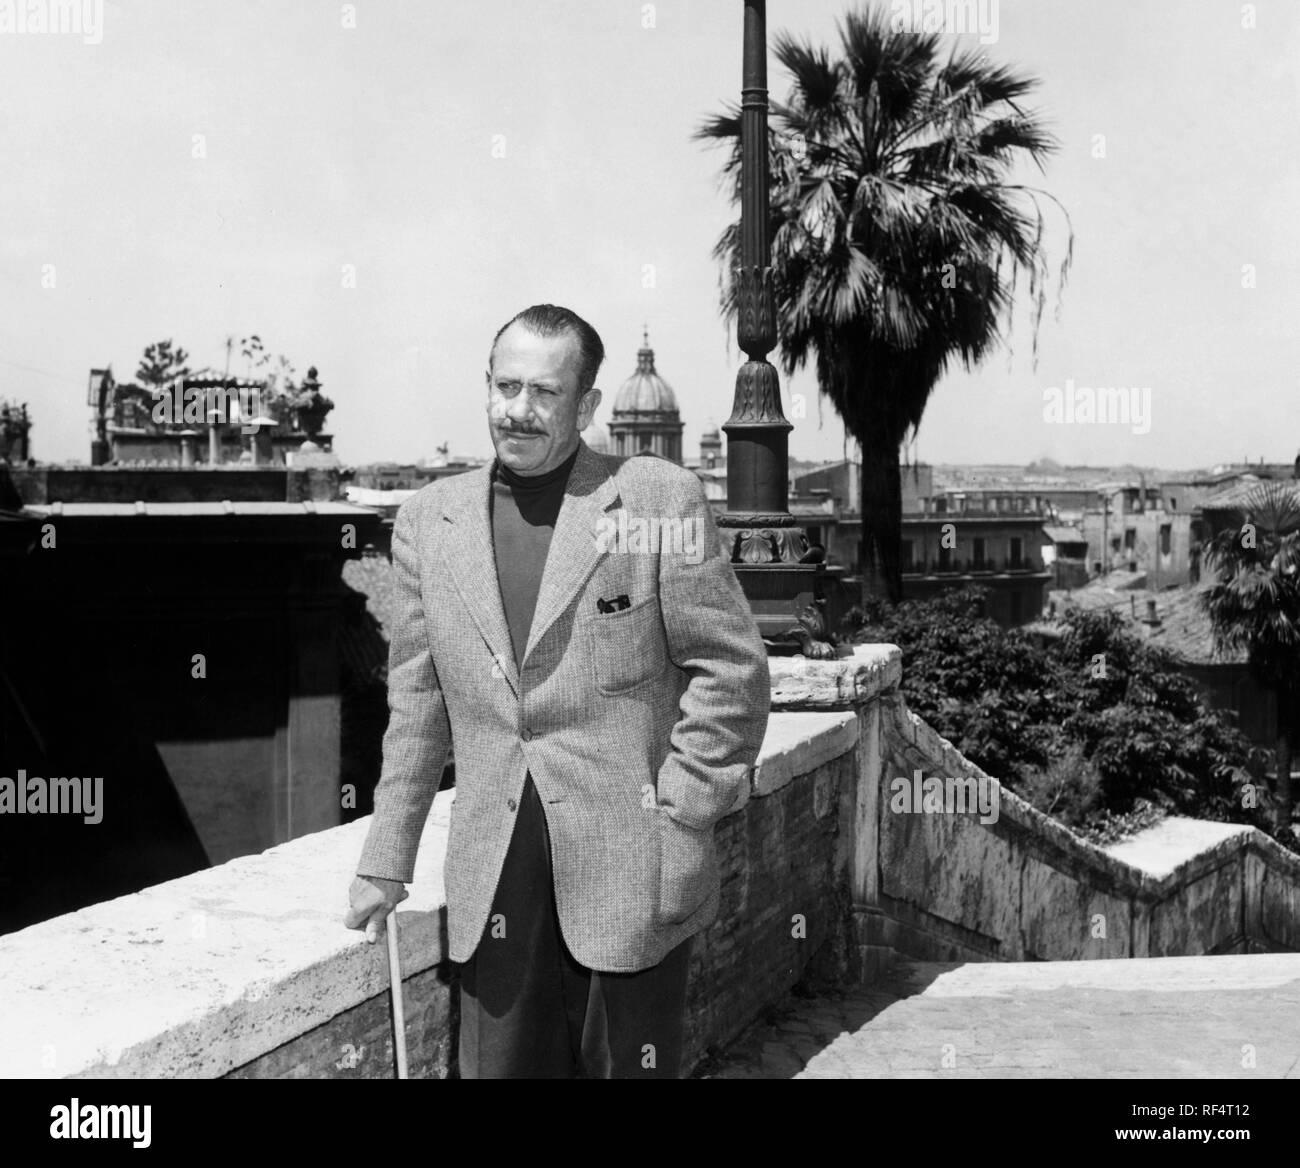 john steinbeck in rome, 1964 Stock Photo